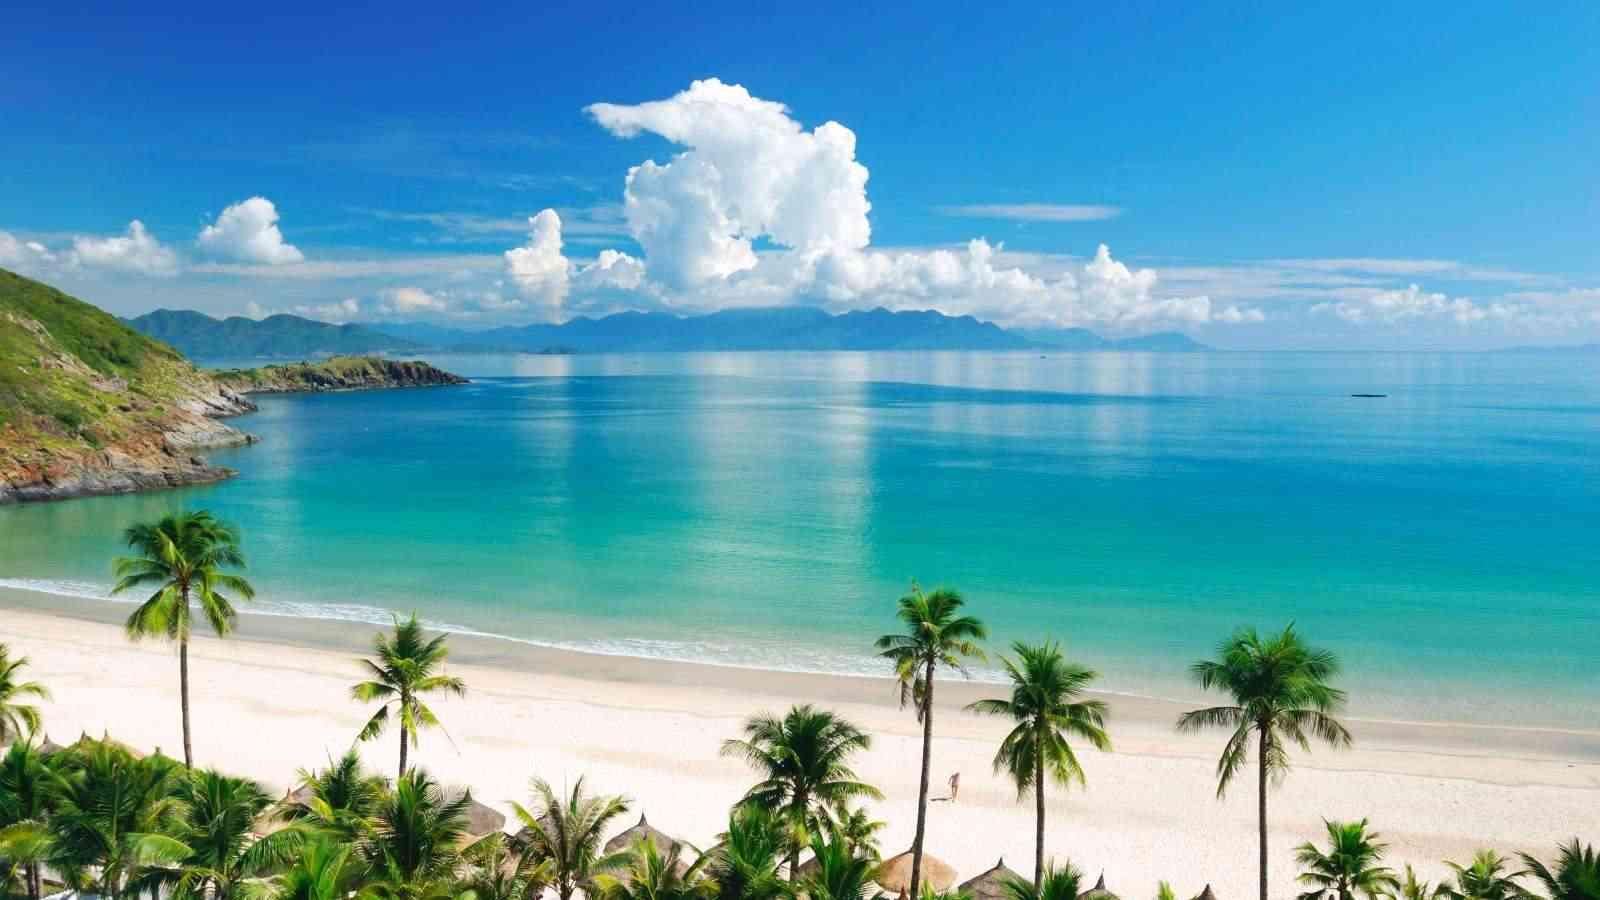 Goa Honeymoon Trip; 4 Days Package